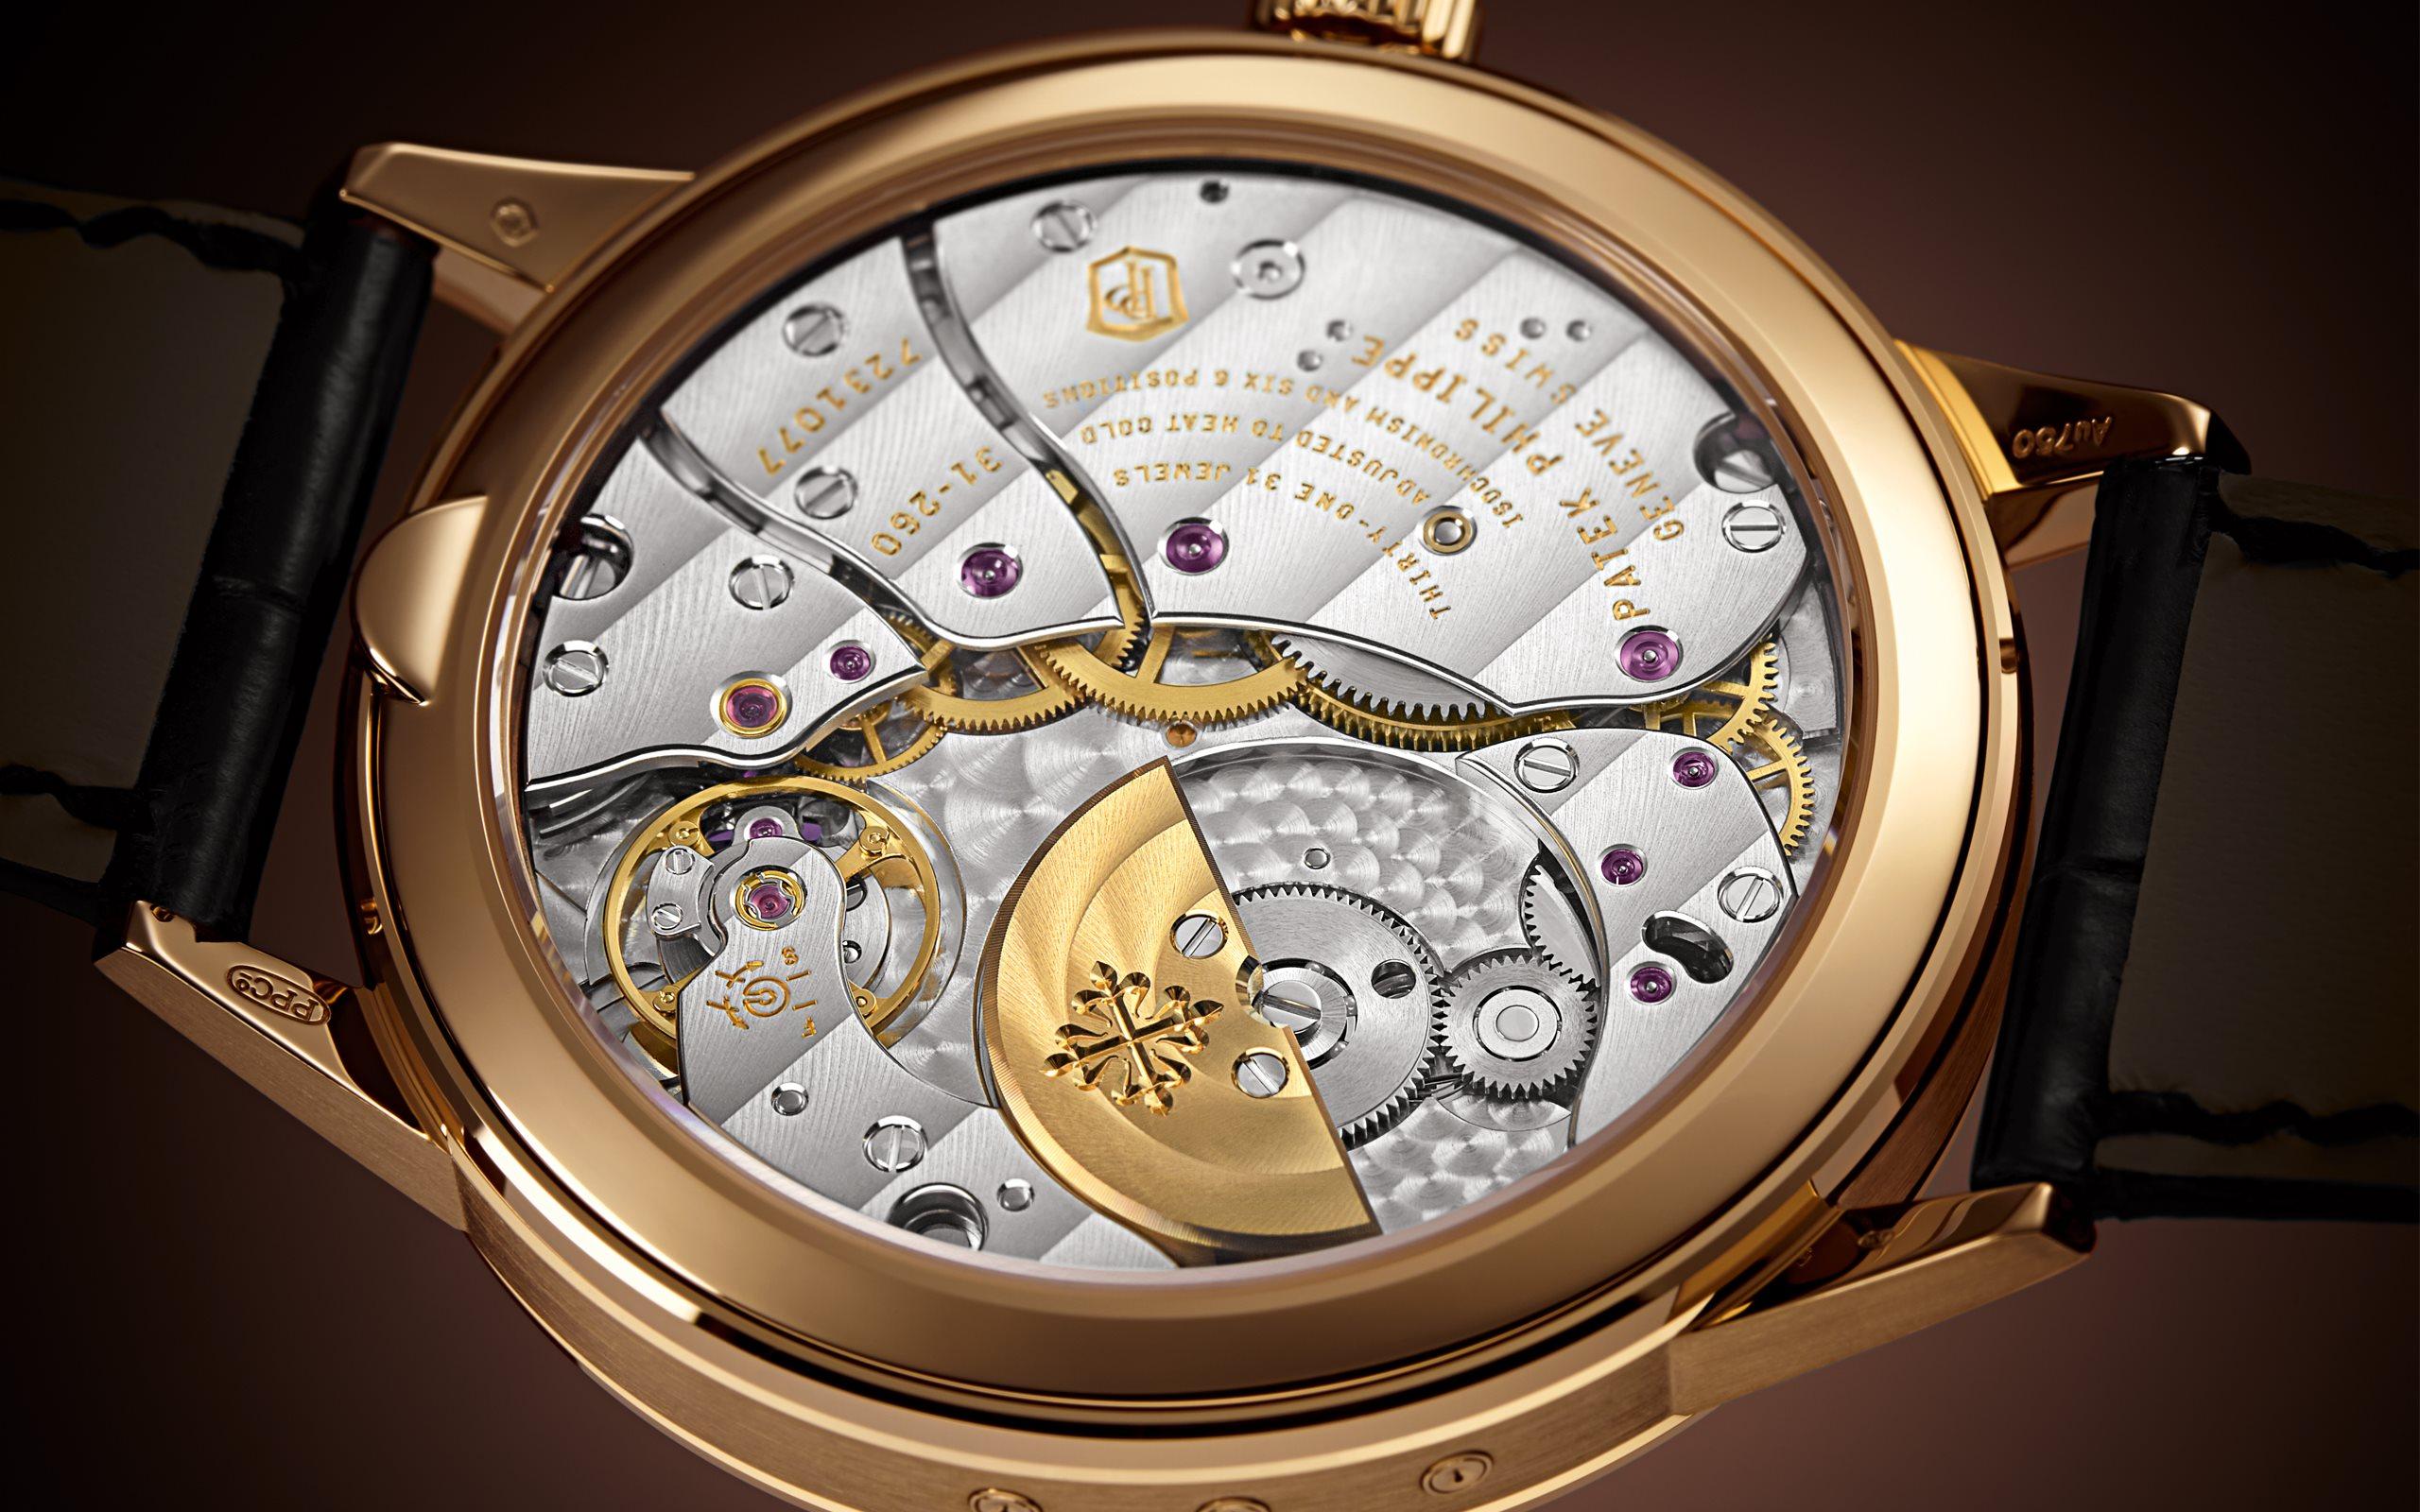 Patek Philippe Annual Calendar Regulator 5235:50R - calibre